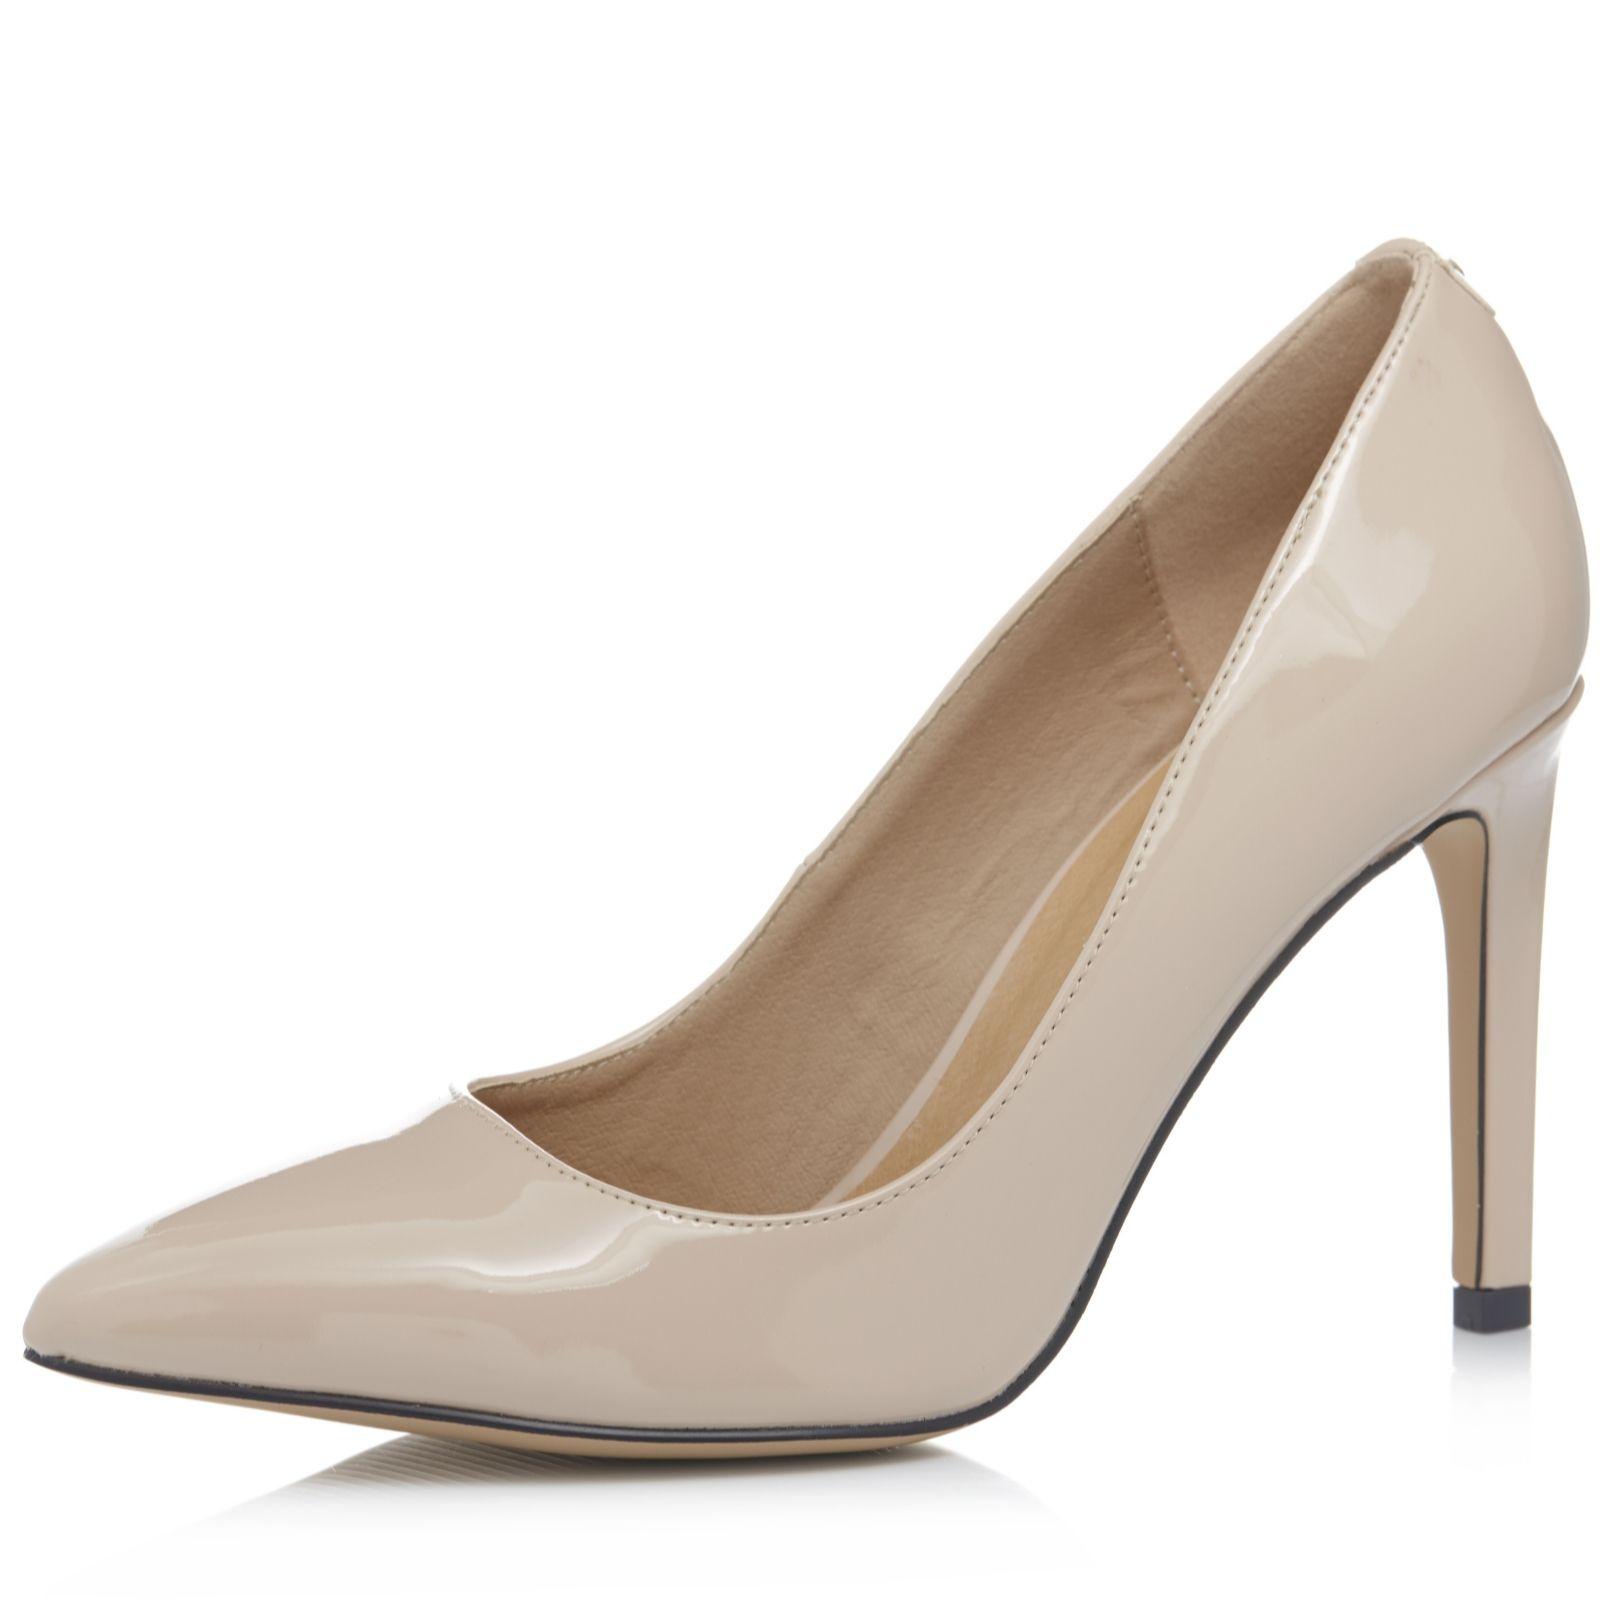 0b34ac62ace8 Ravel Edson Point Court Shoe - QVC UK